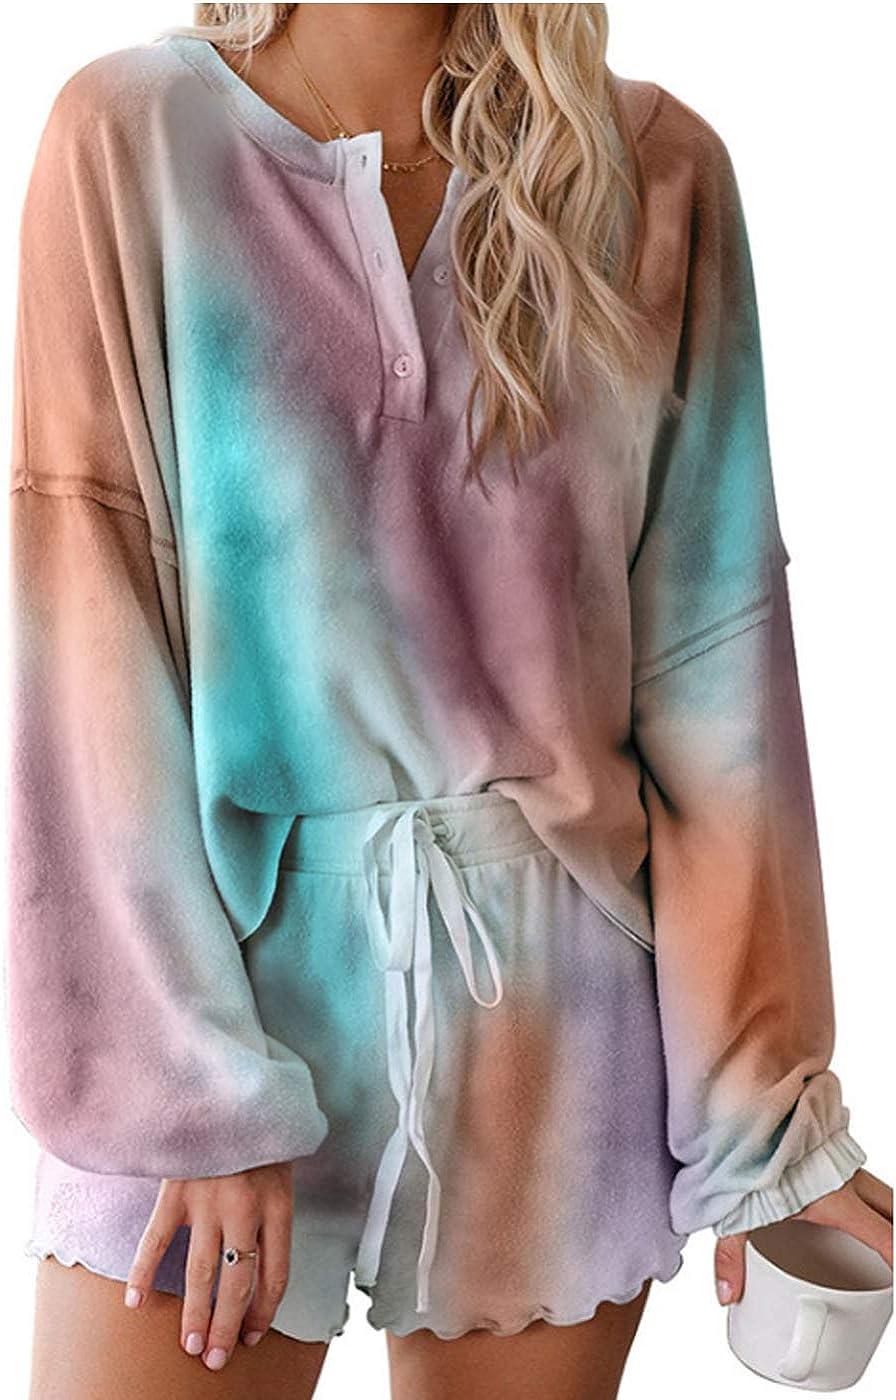 HARGLESMAN Womens Tie Dye Printed Ruffle Short Lounge Set Long Sleeve Tops and Shorts 2 Piece Pajamas Set Sleepwear